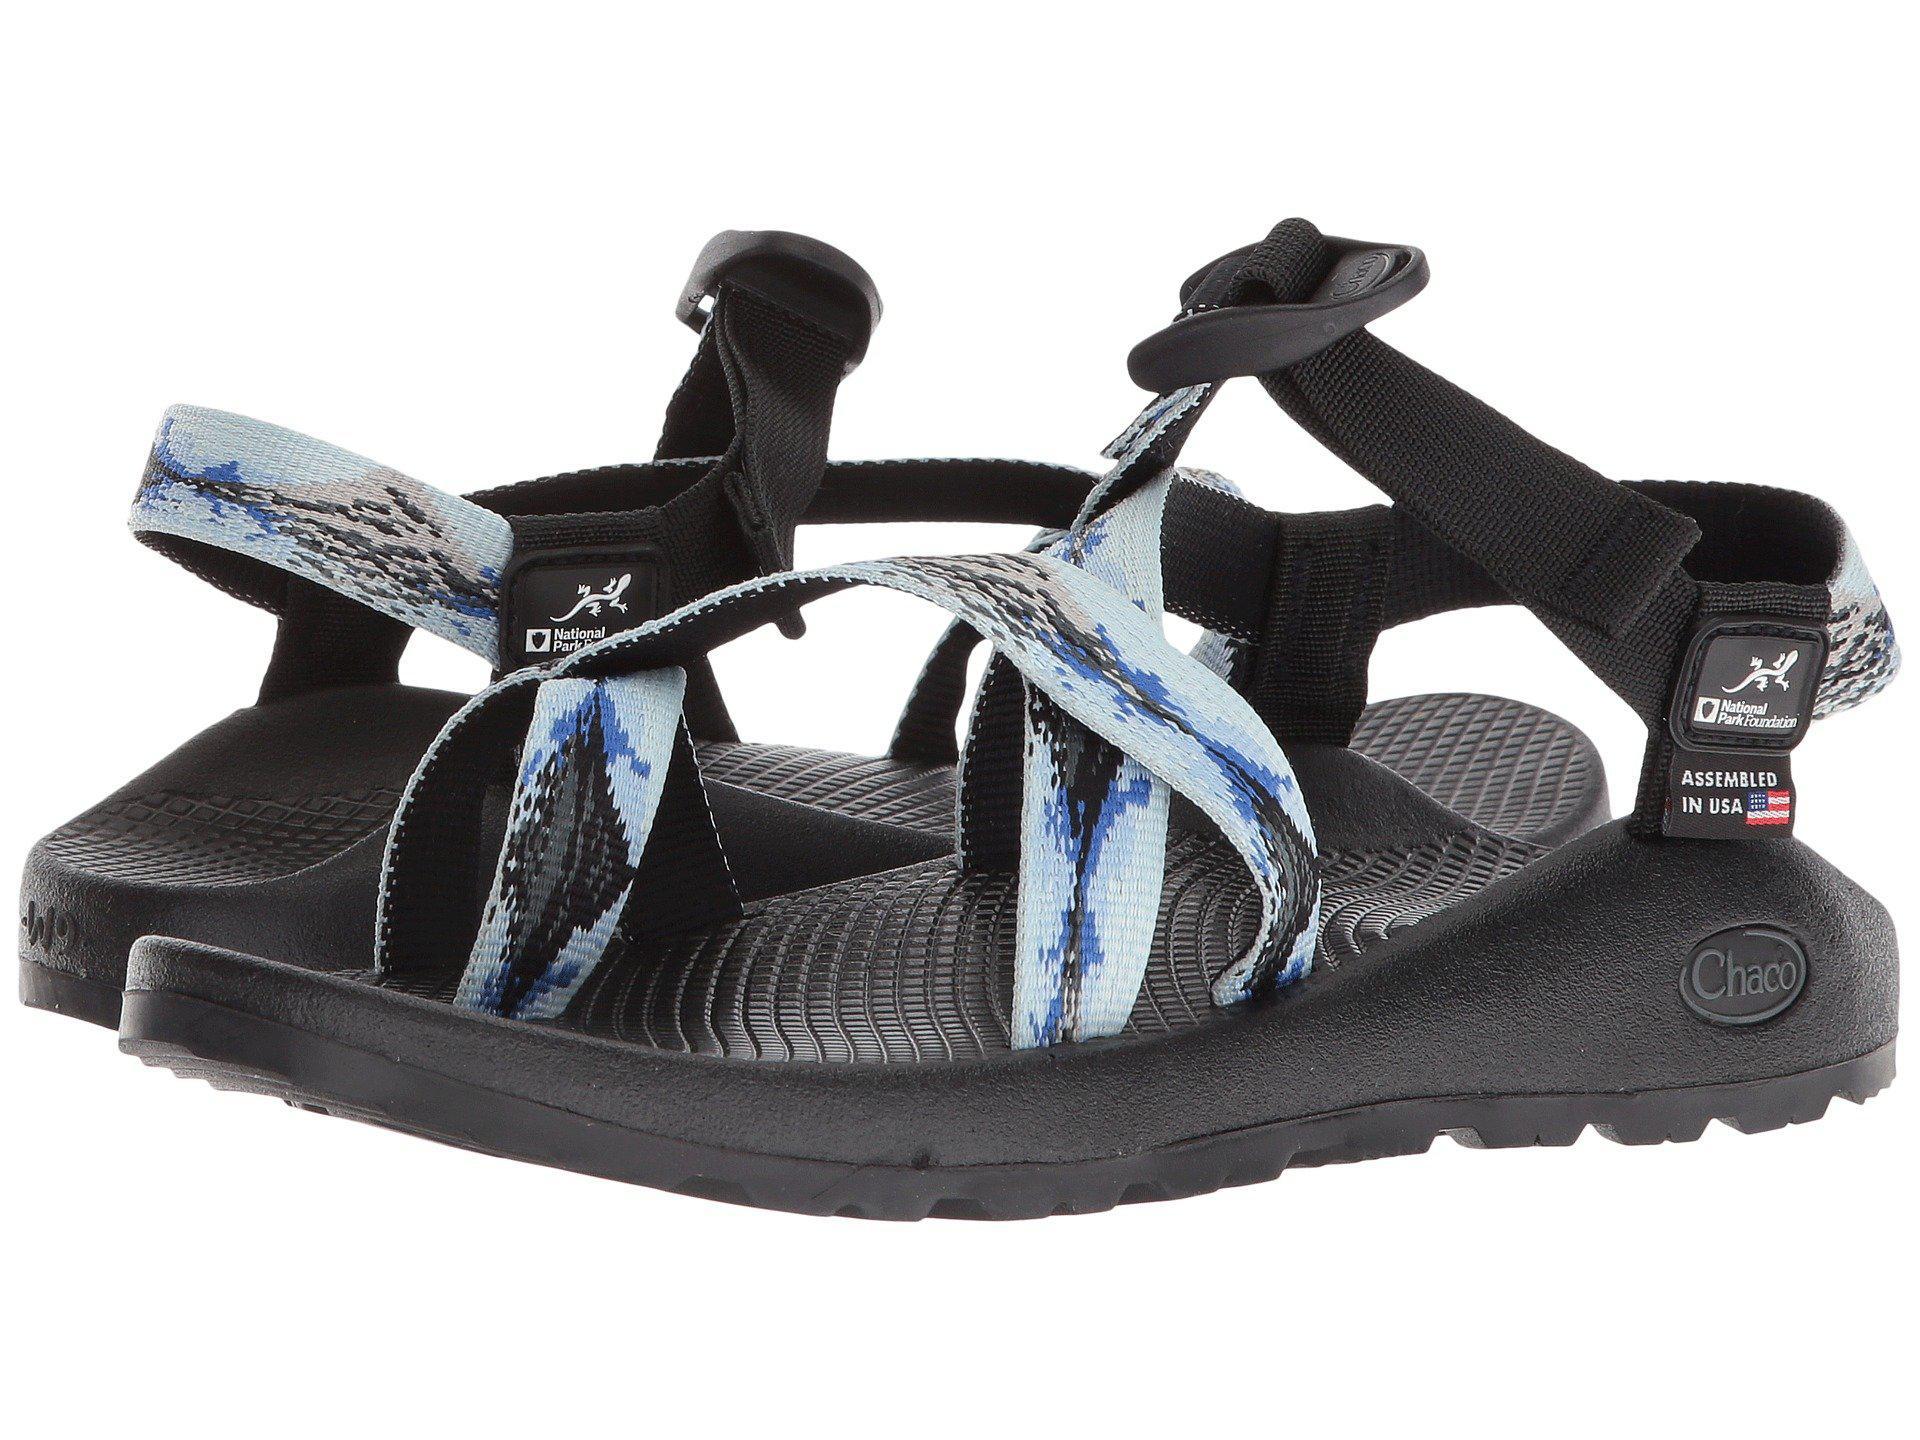 ff83ffd13f69 Lyst - Chaco Z 2(r) Glacier (glacier Black) Women s Shoes in Black